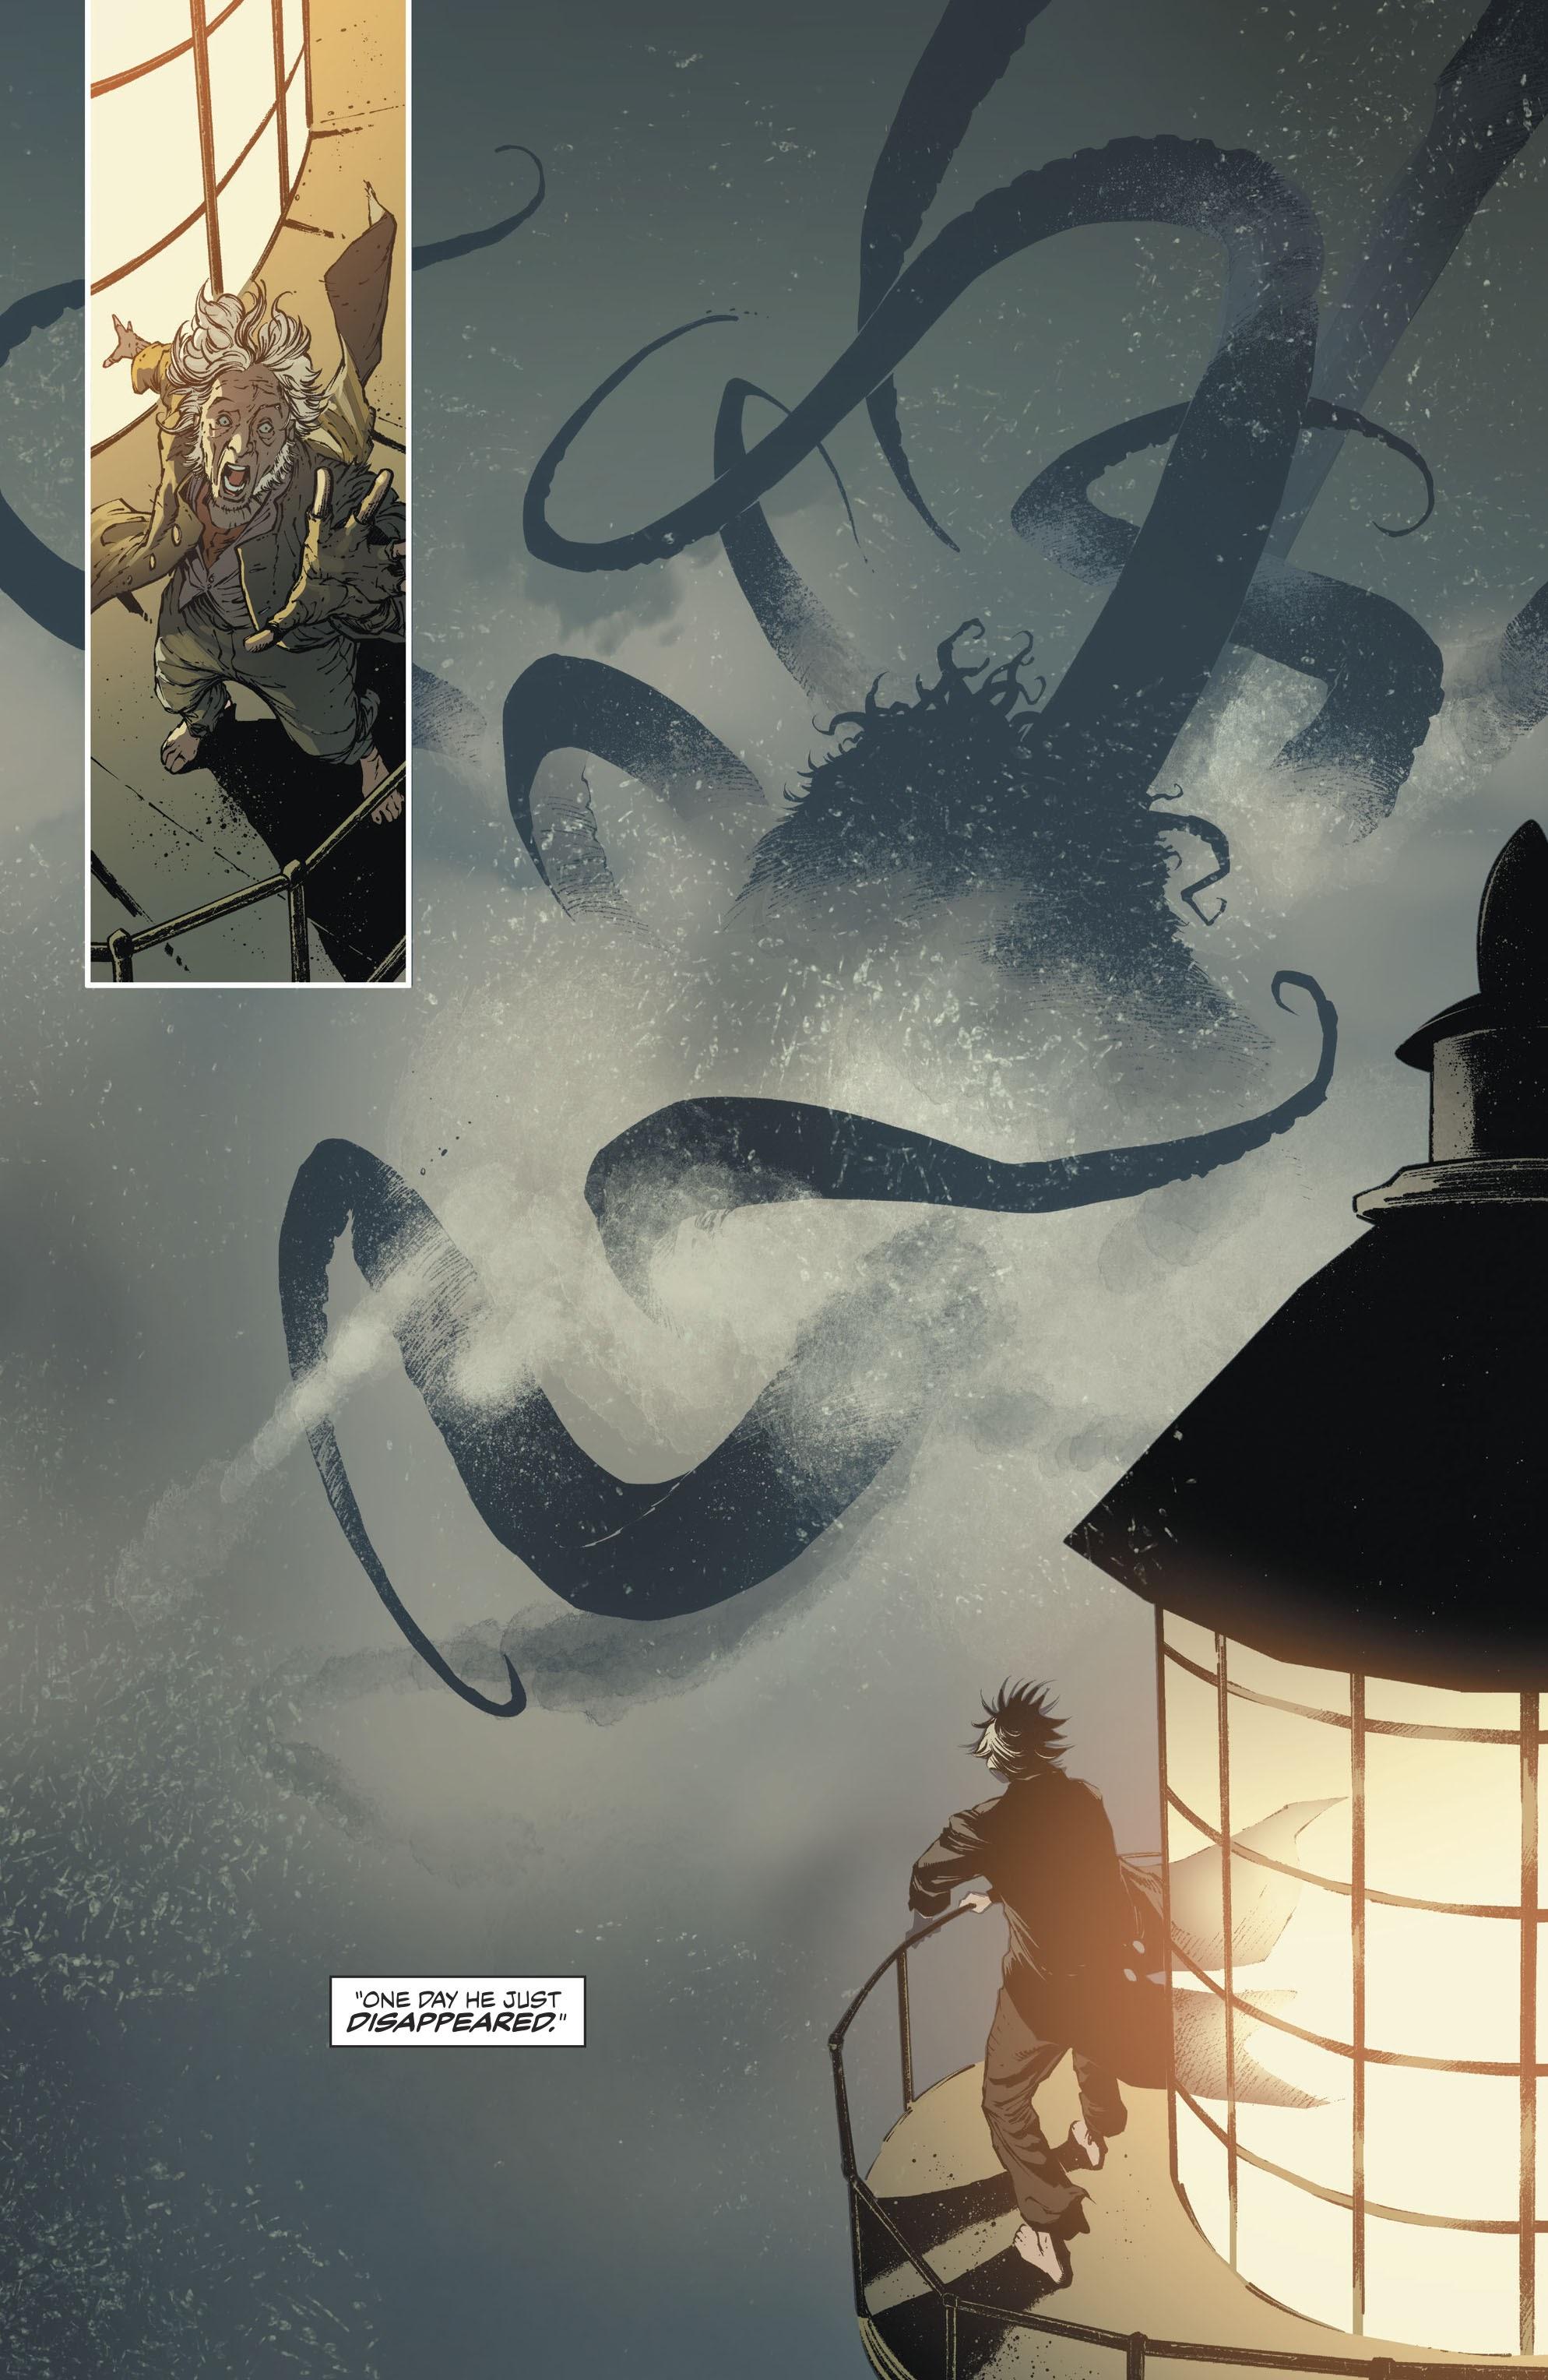 【DC宇宙相關】許久不見的水行俠死對頭「黑蝠鱝」因為《惡棍年》號召而回歸前線!